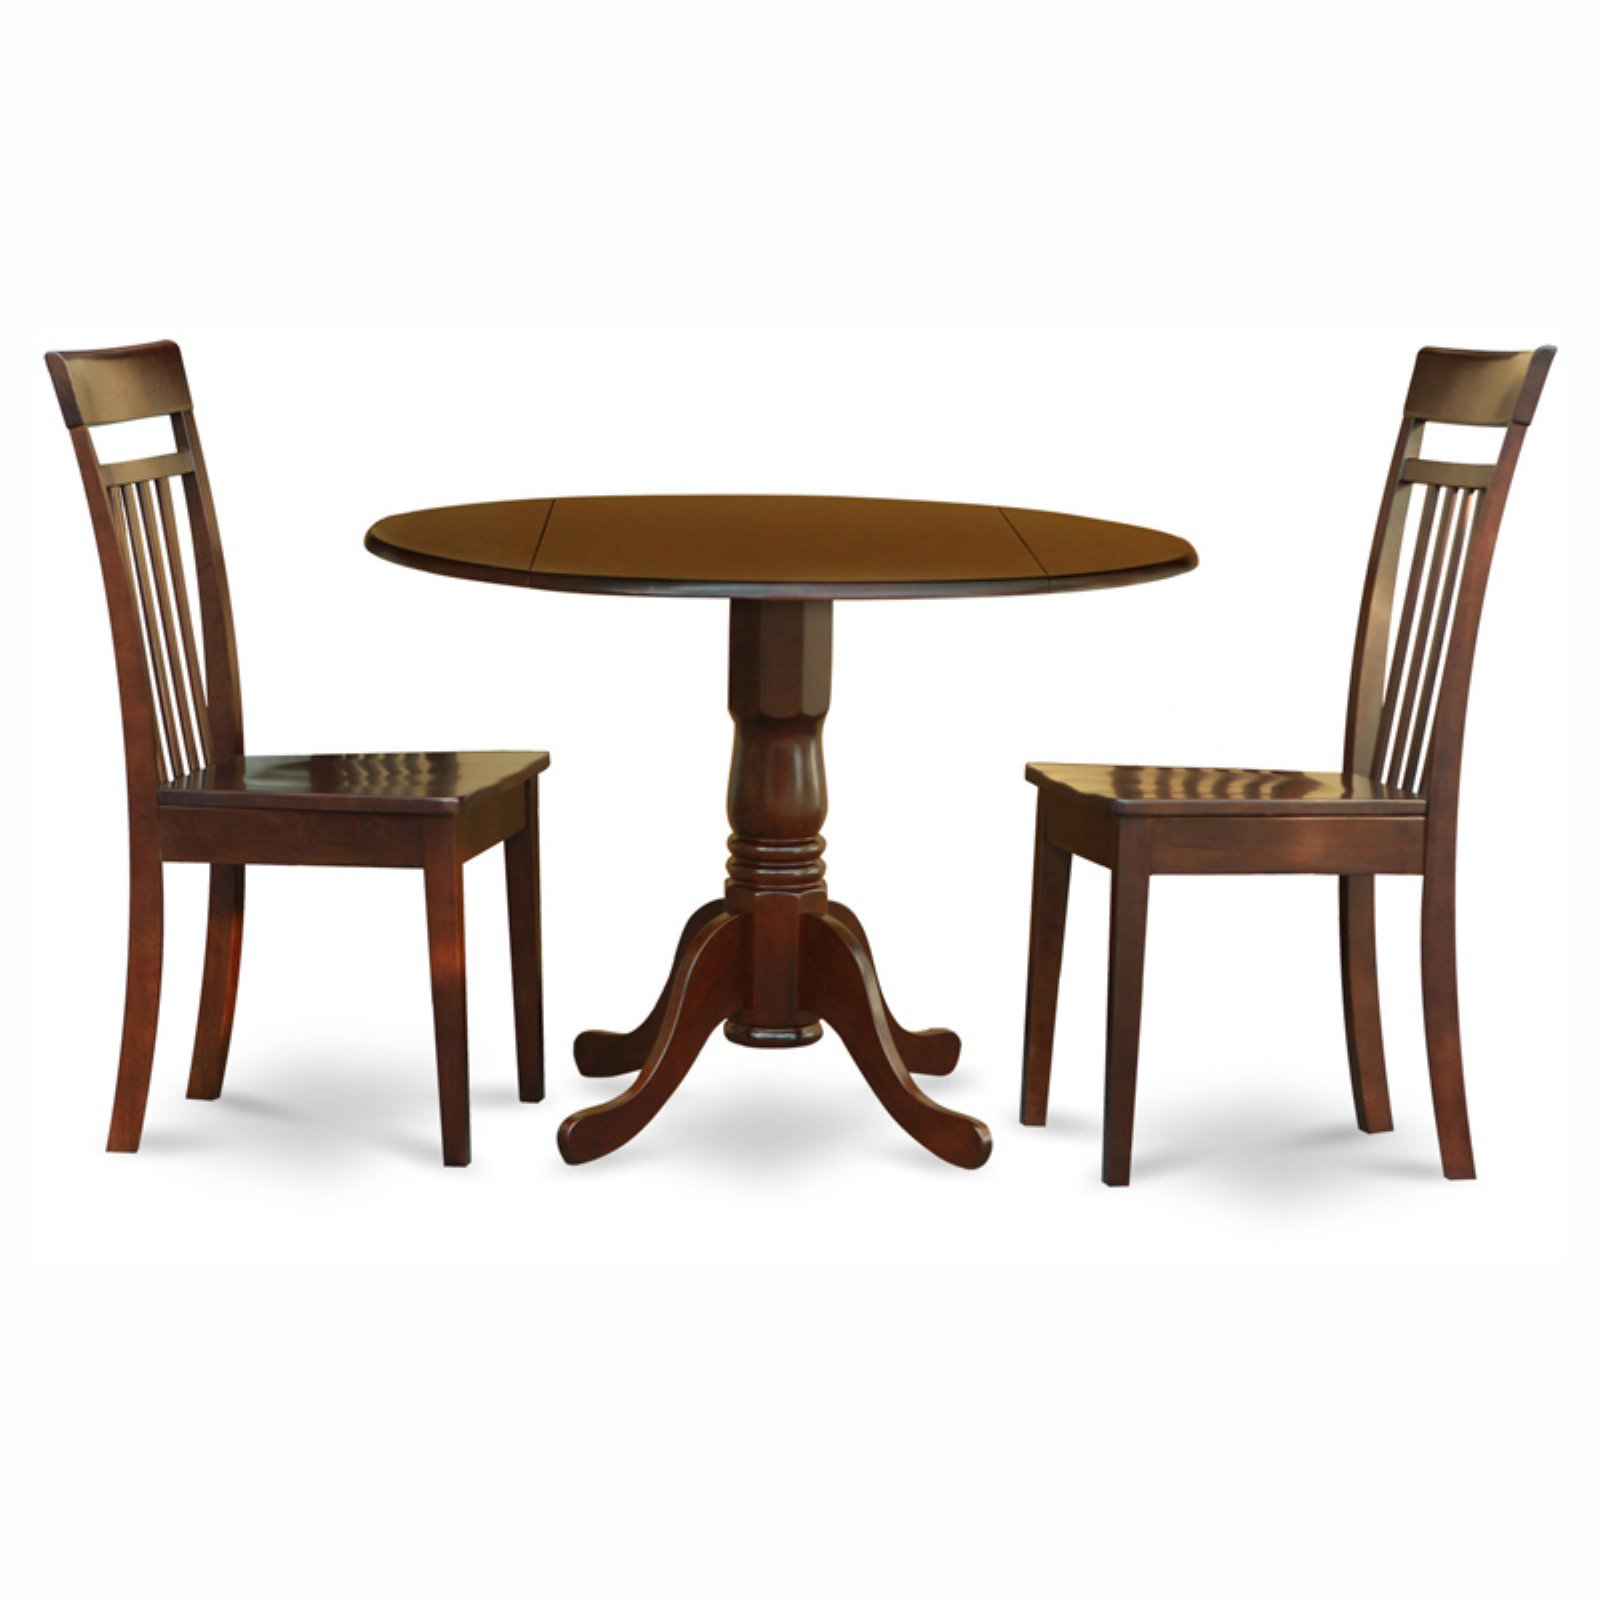 East West Furniture Dublin 3 Piece Drop Leaf Dining Table ...